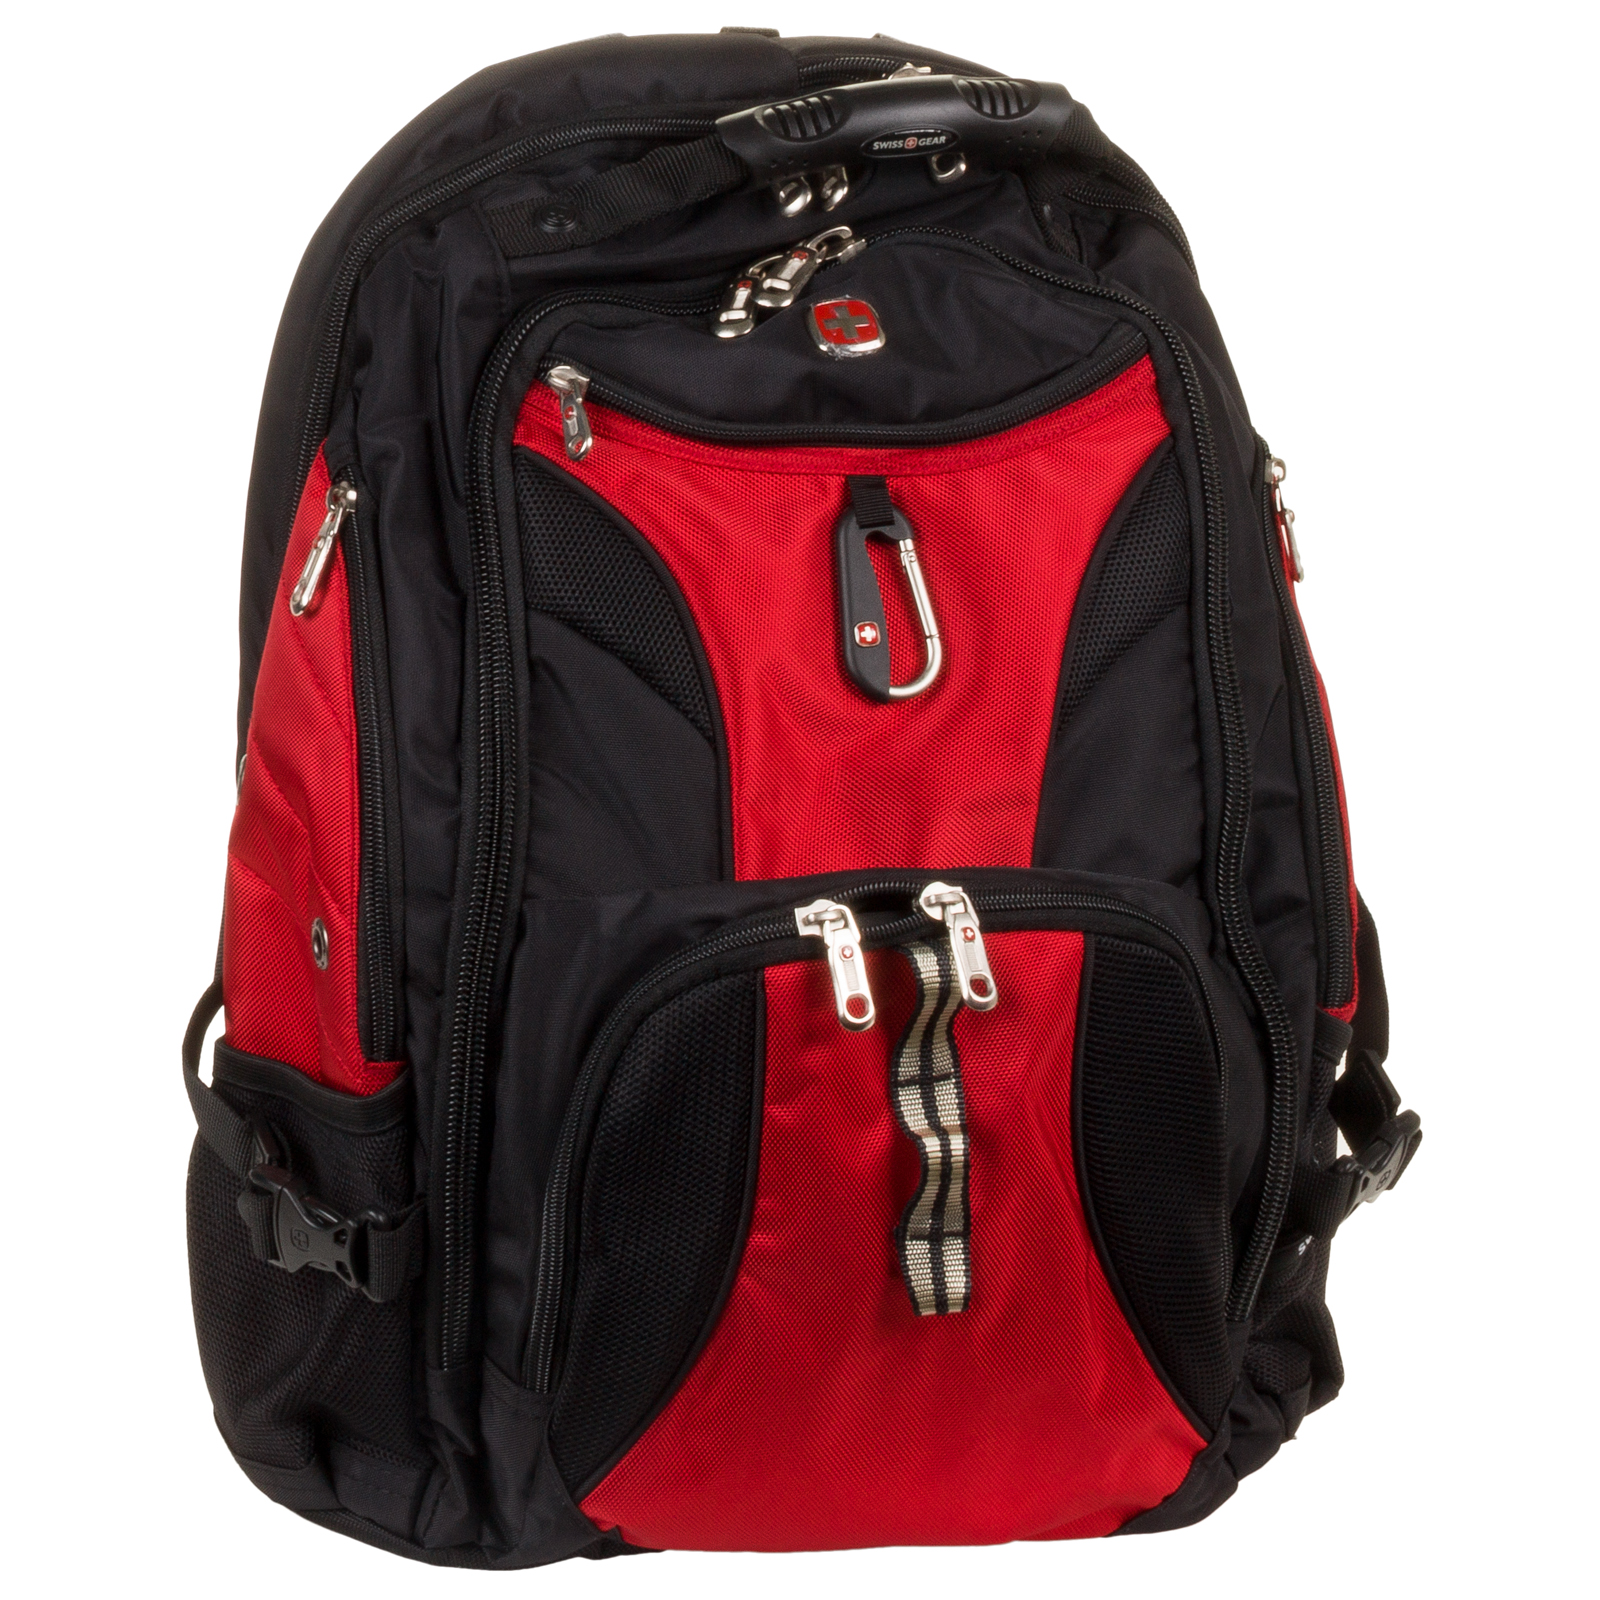 "Swiss Gear 17"" Red Travel Gear Smart Scan Laptop Backpack Bookbag ..."